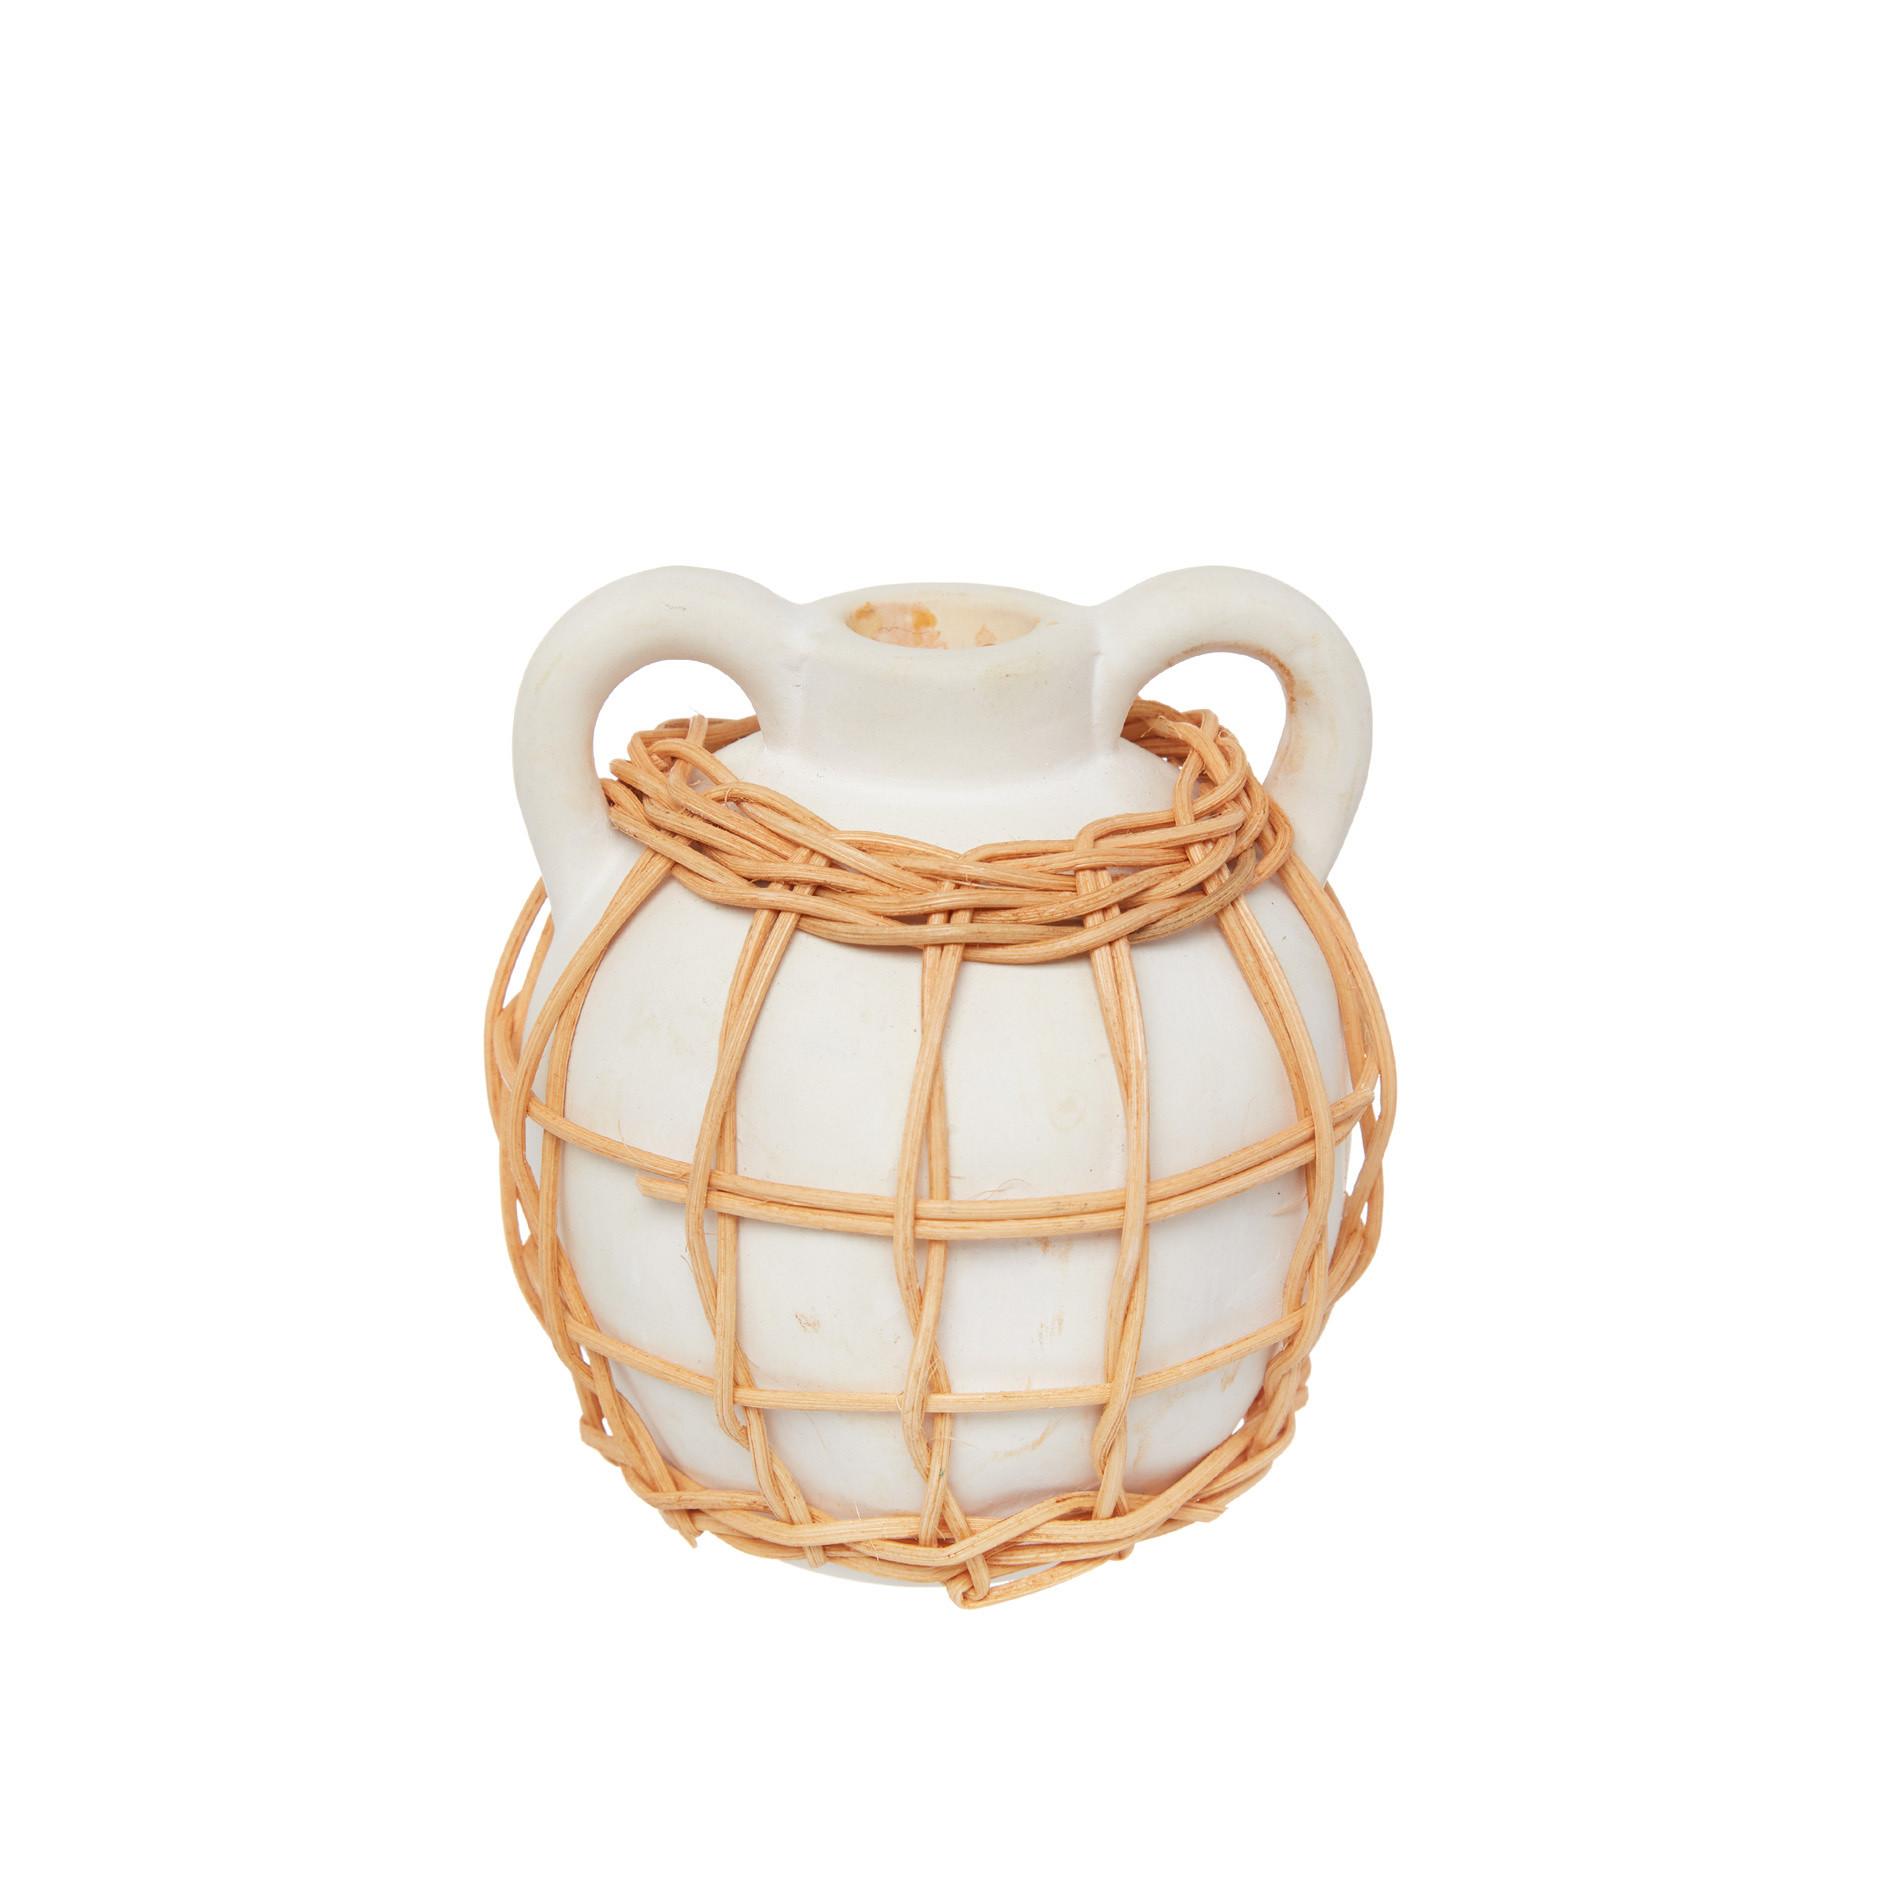 Candeliere ceramica deco rattan, Bianco, large image number 0